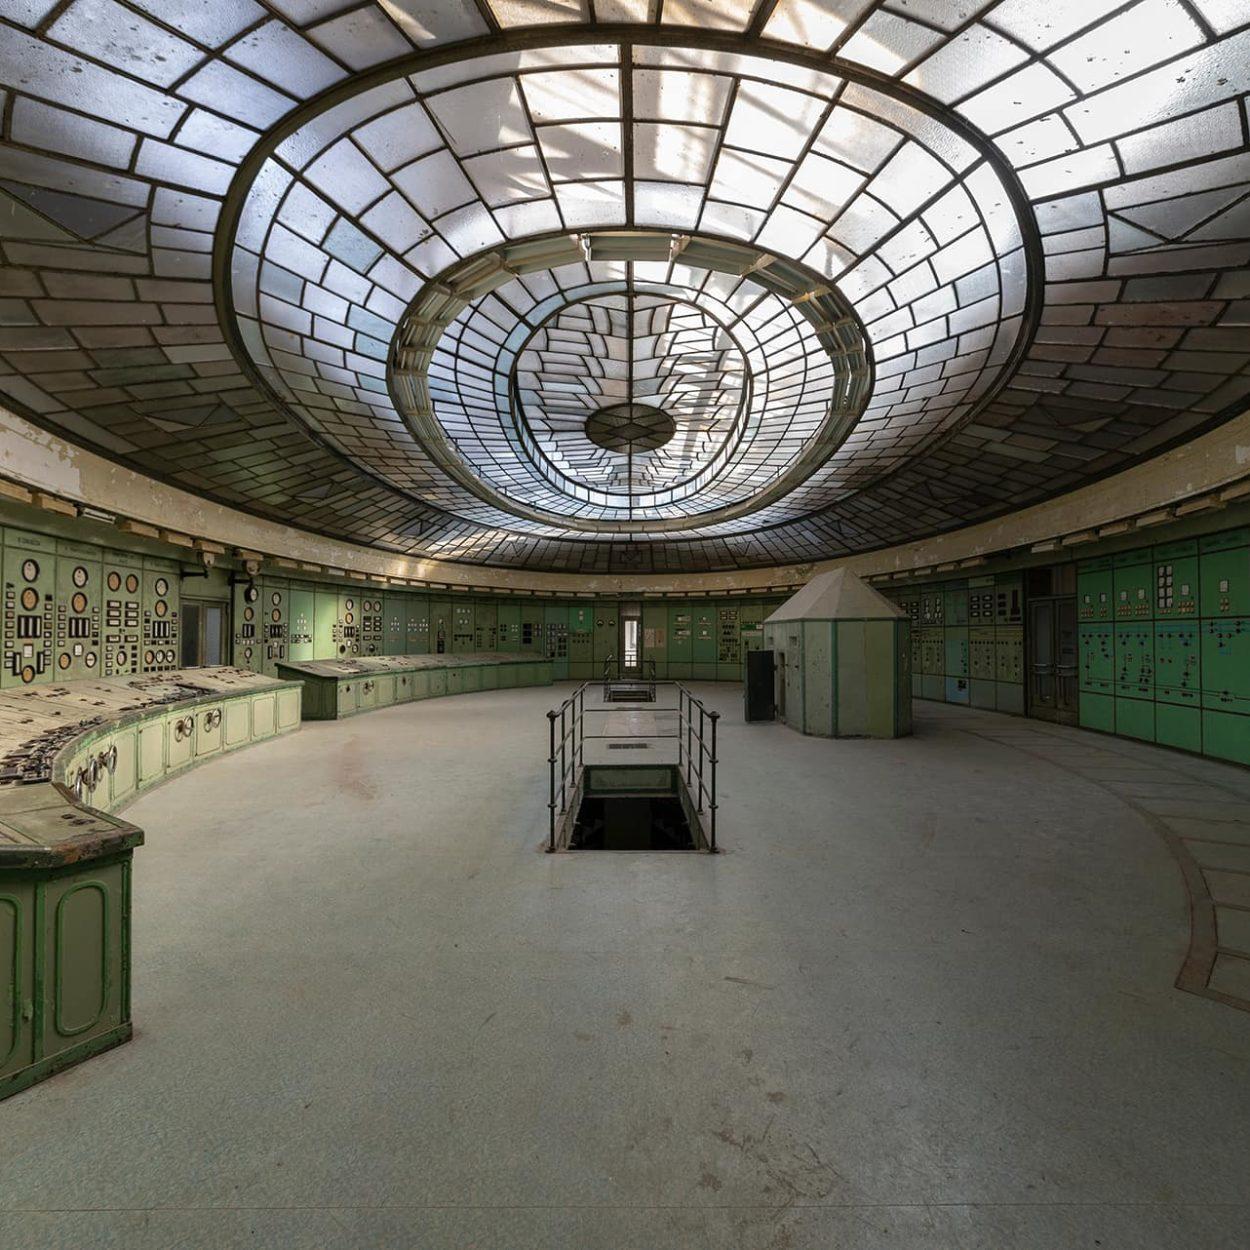 urbex-urban-exploration-hongrie-industriel-kelenfold-salle-commande